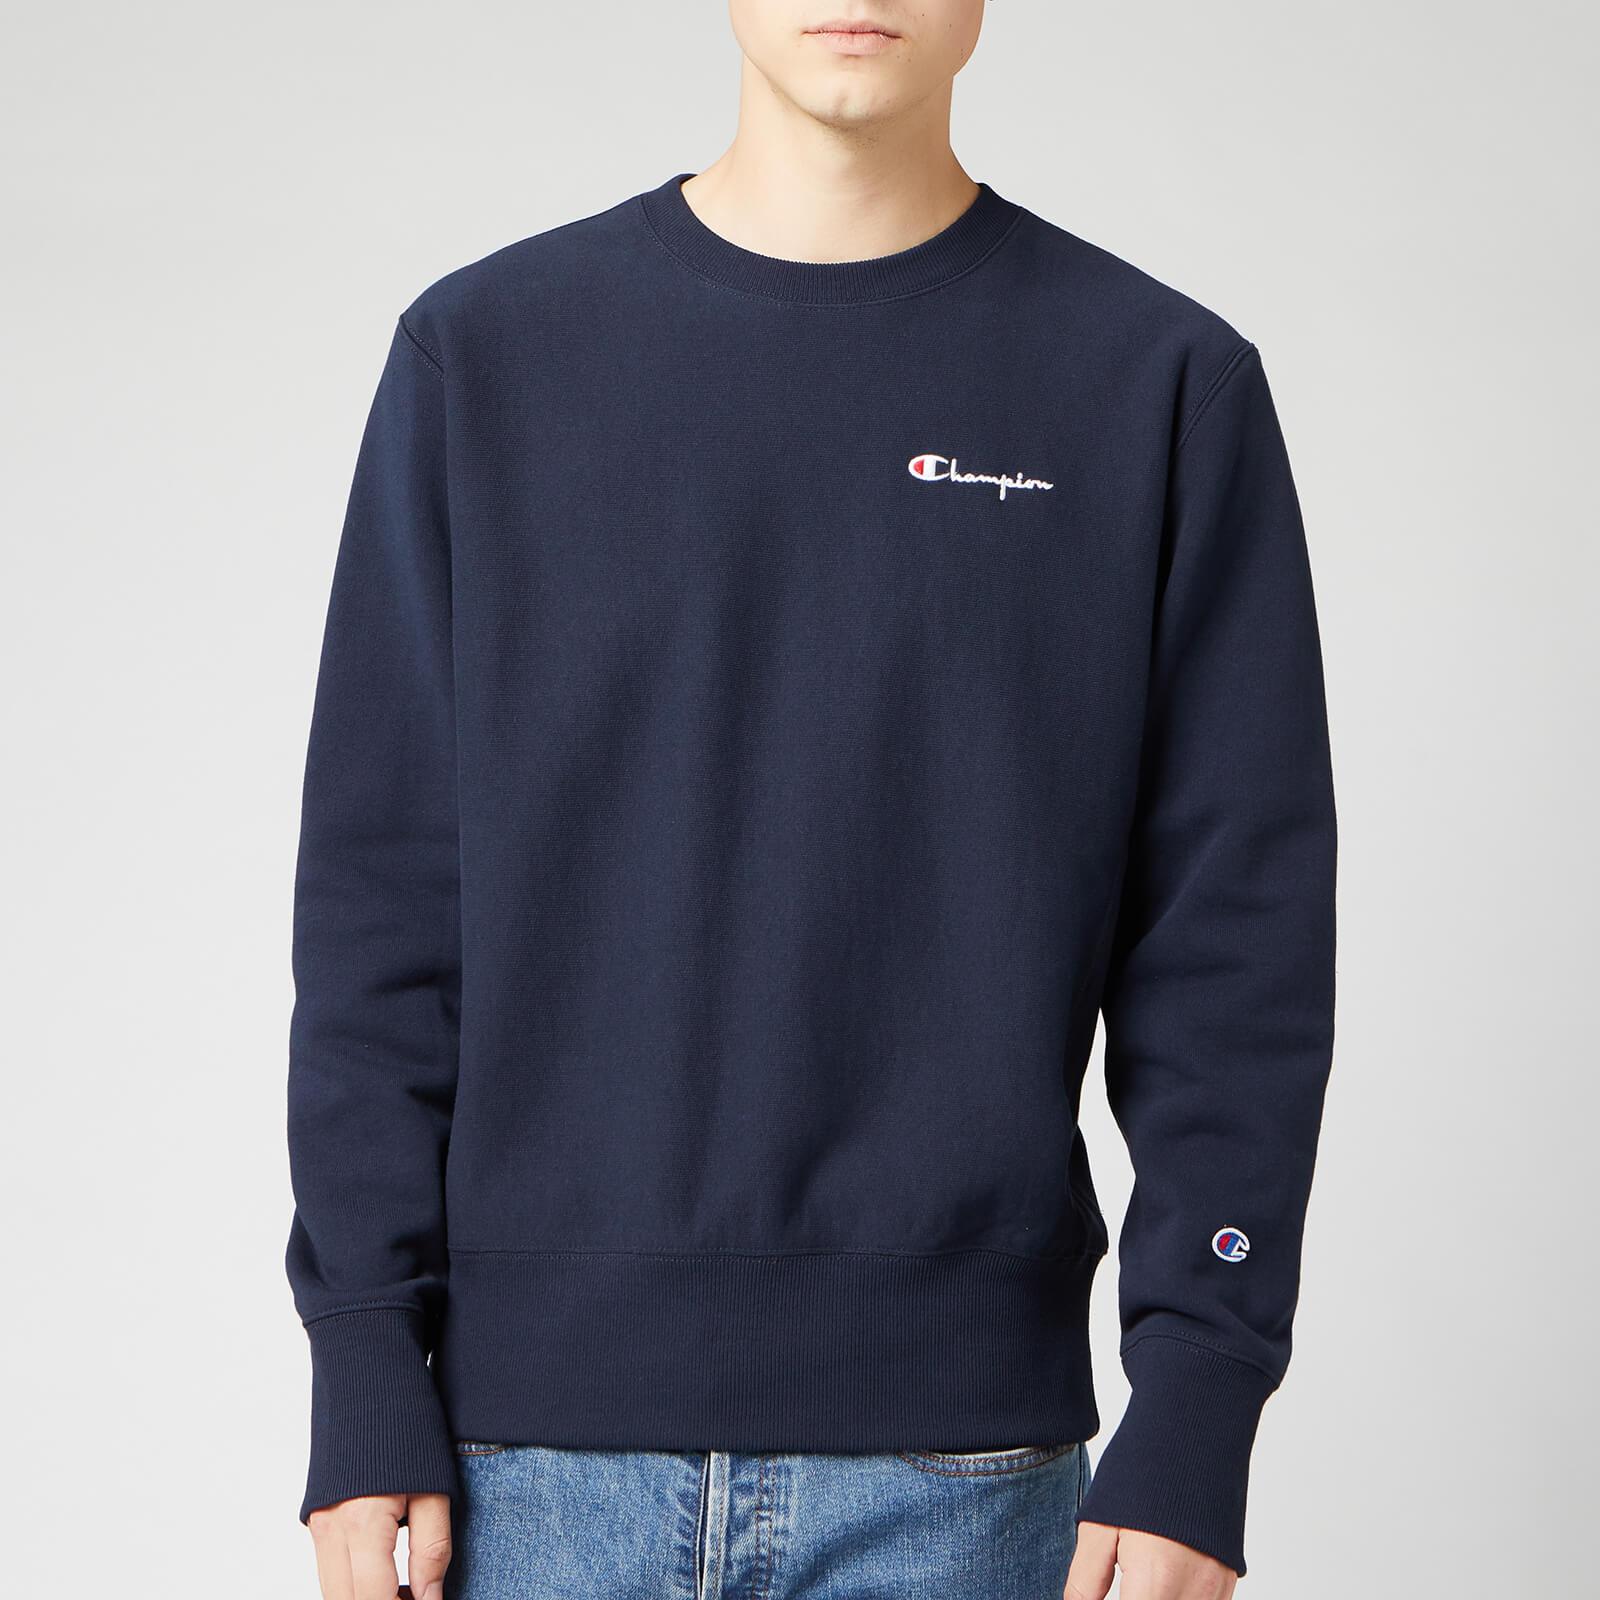 Champion Men's Small Script Sweatshirt - Navy - XL